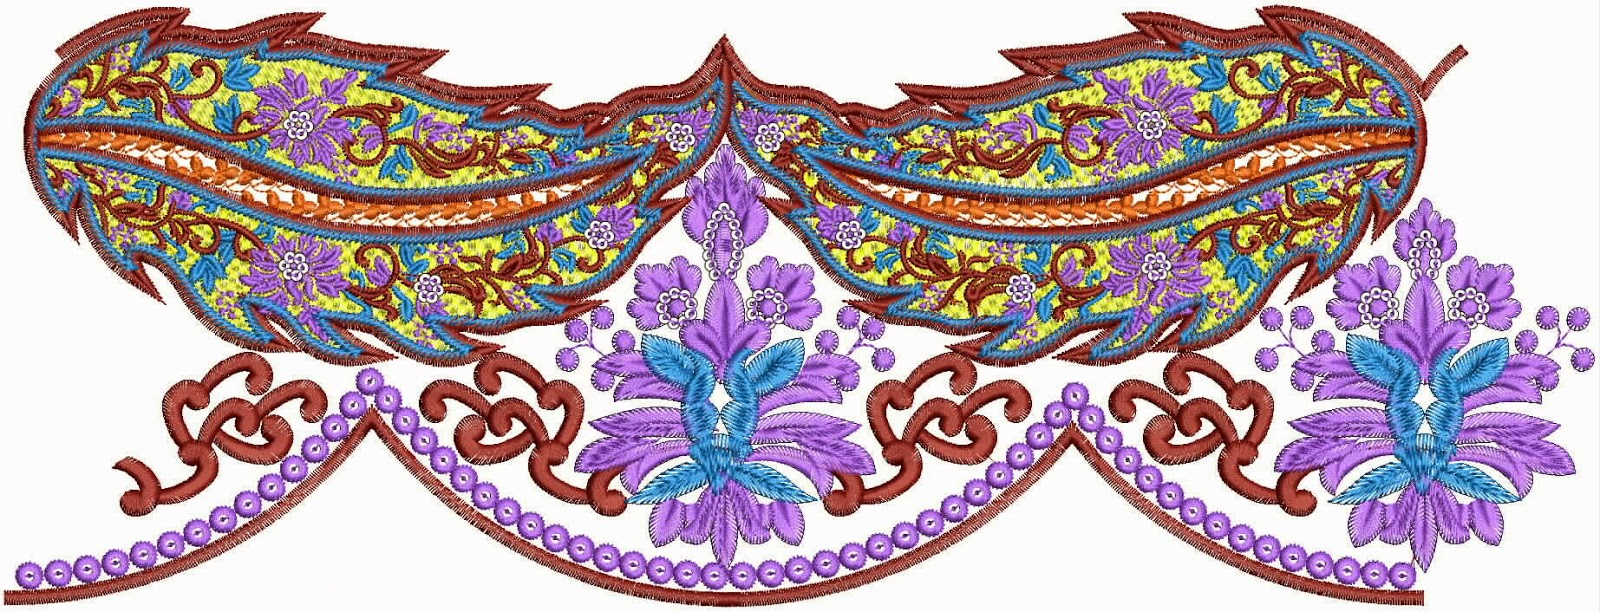 Embdesigntube Wedding Wear Embroidery Lace Border Designs